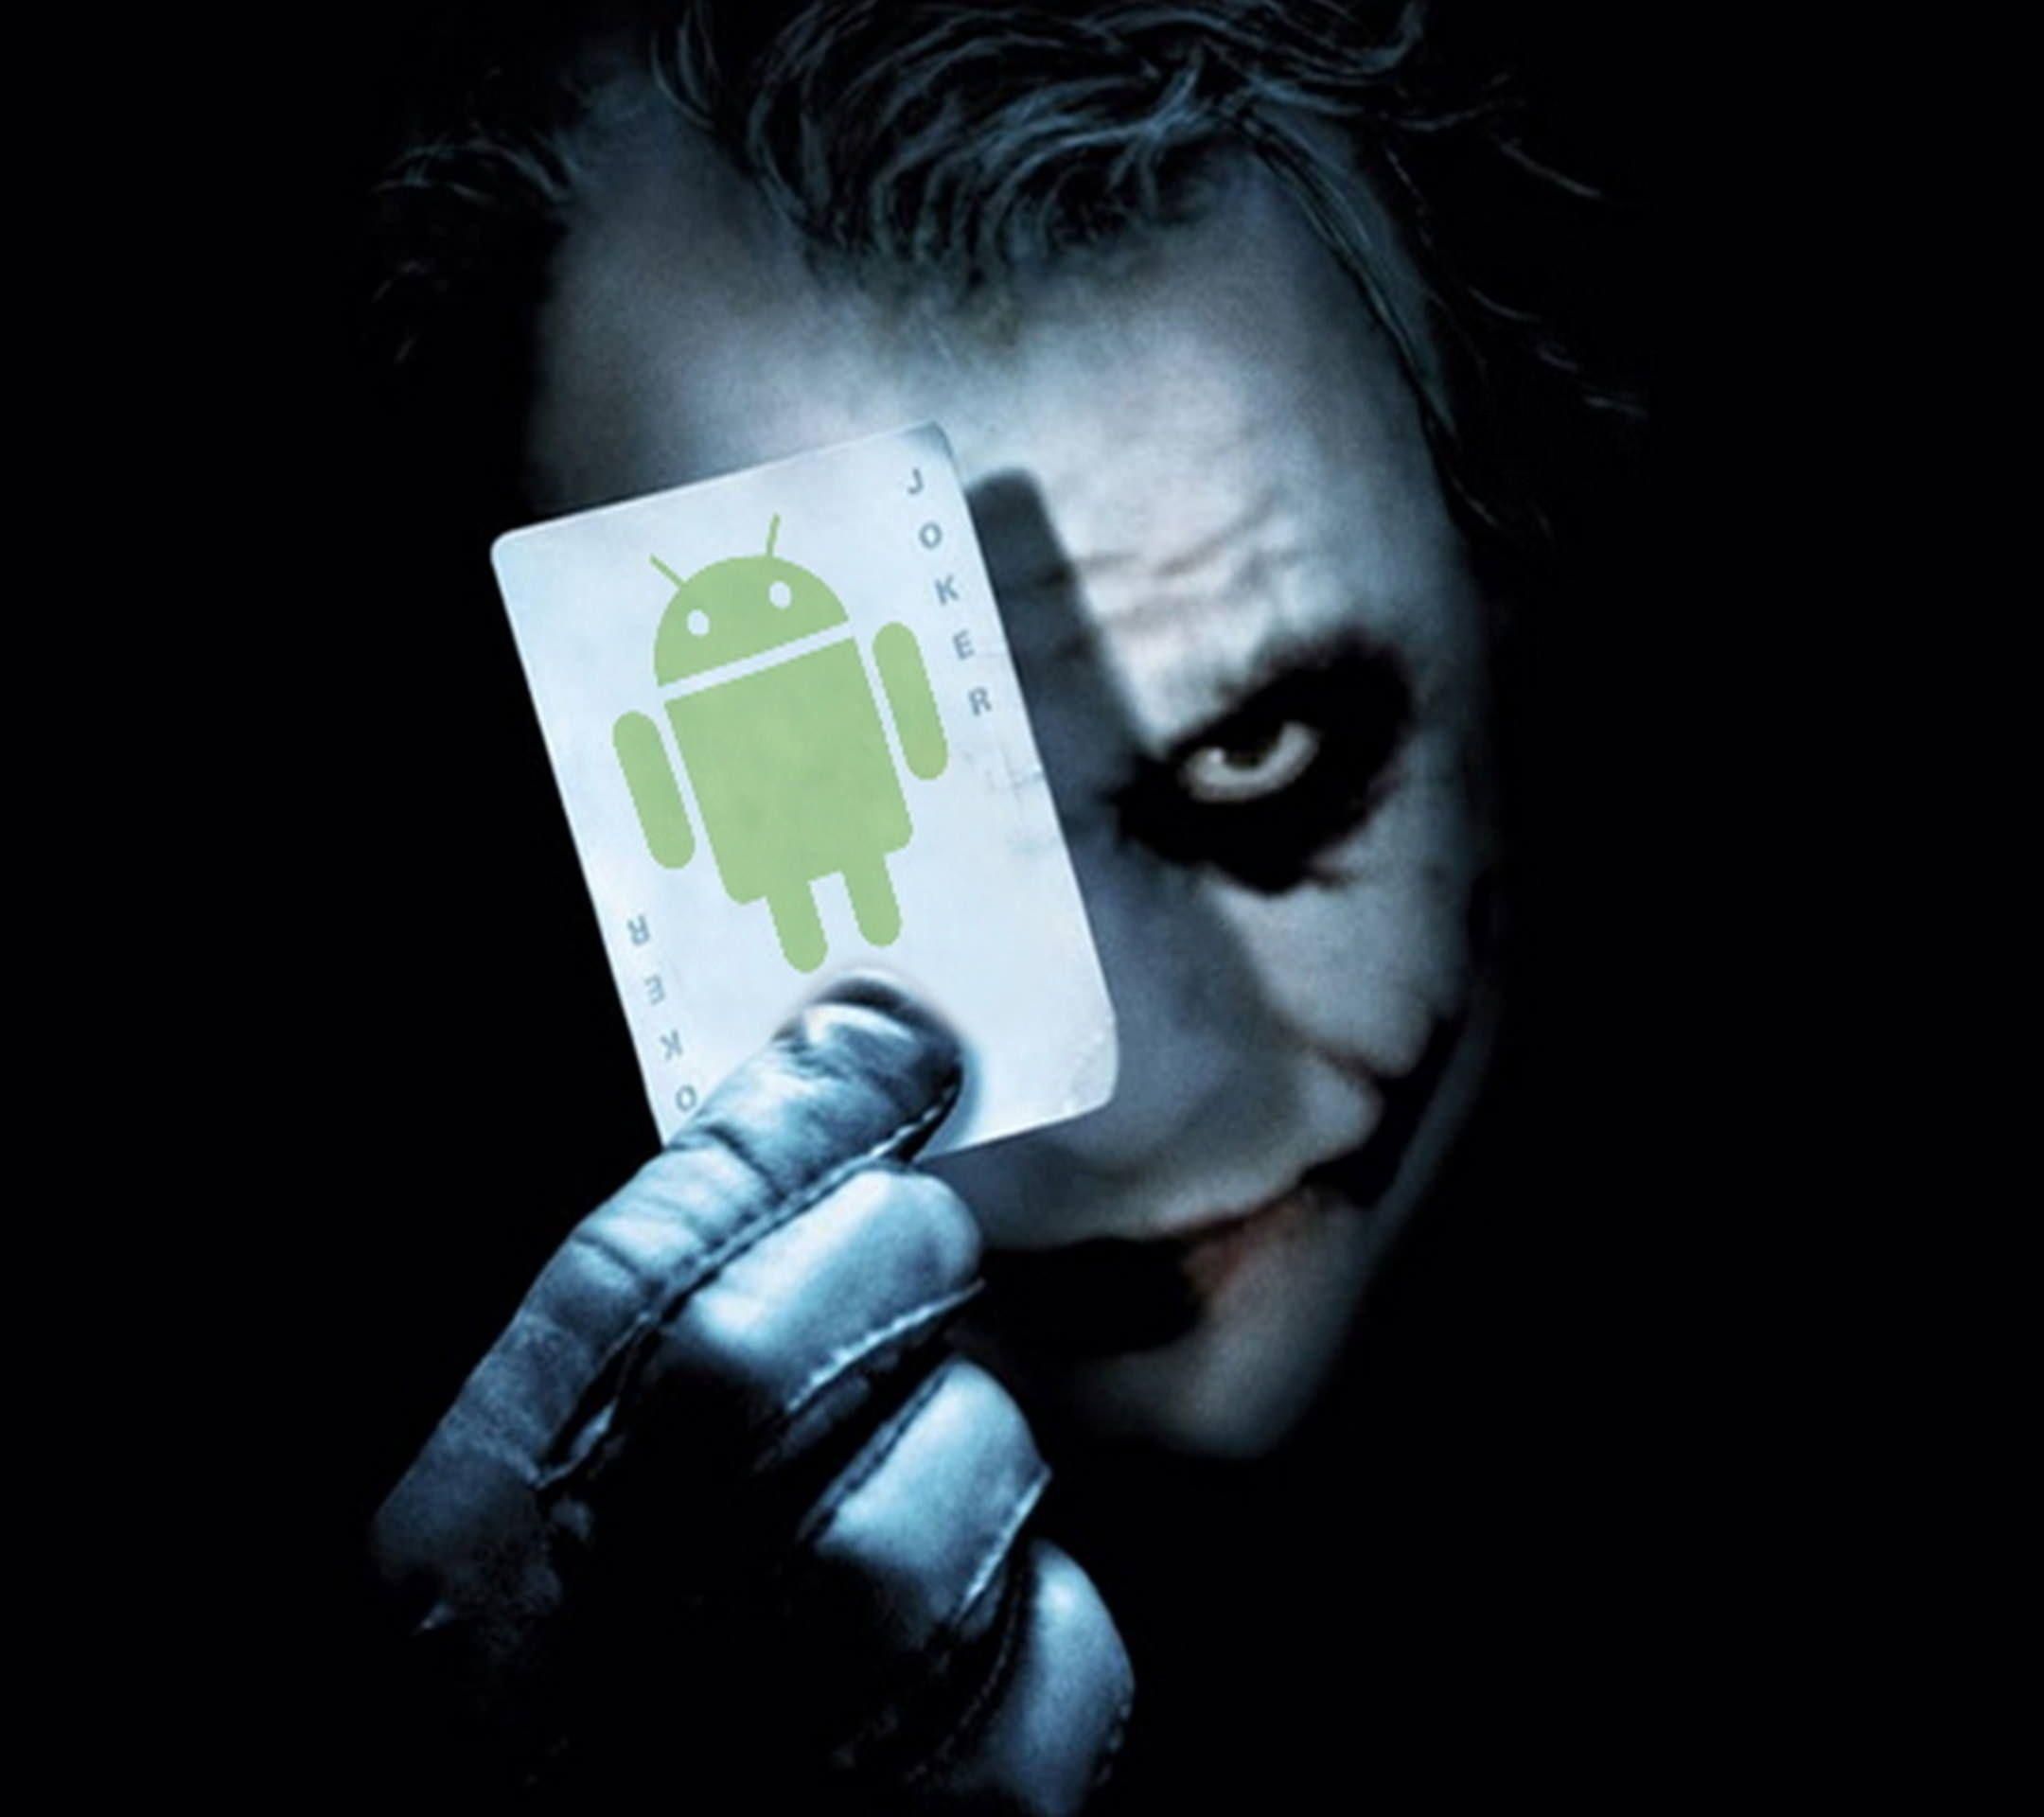 Android logo Chara Joker | wallpaper.sc SmartPhone